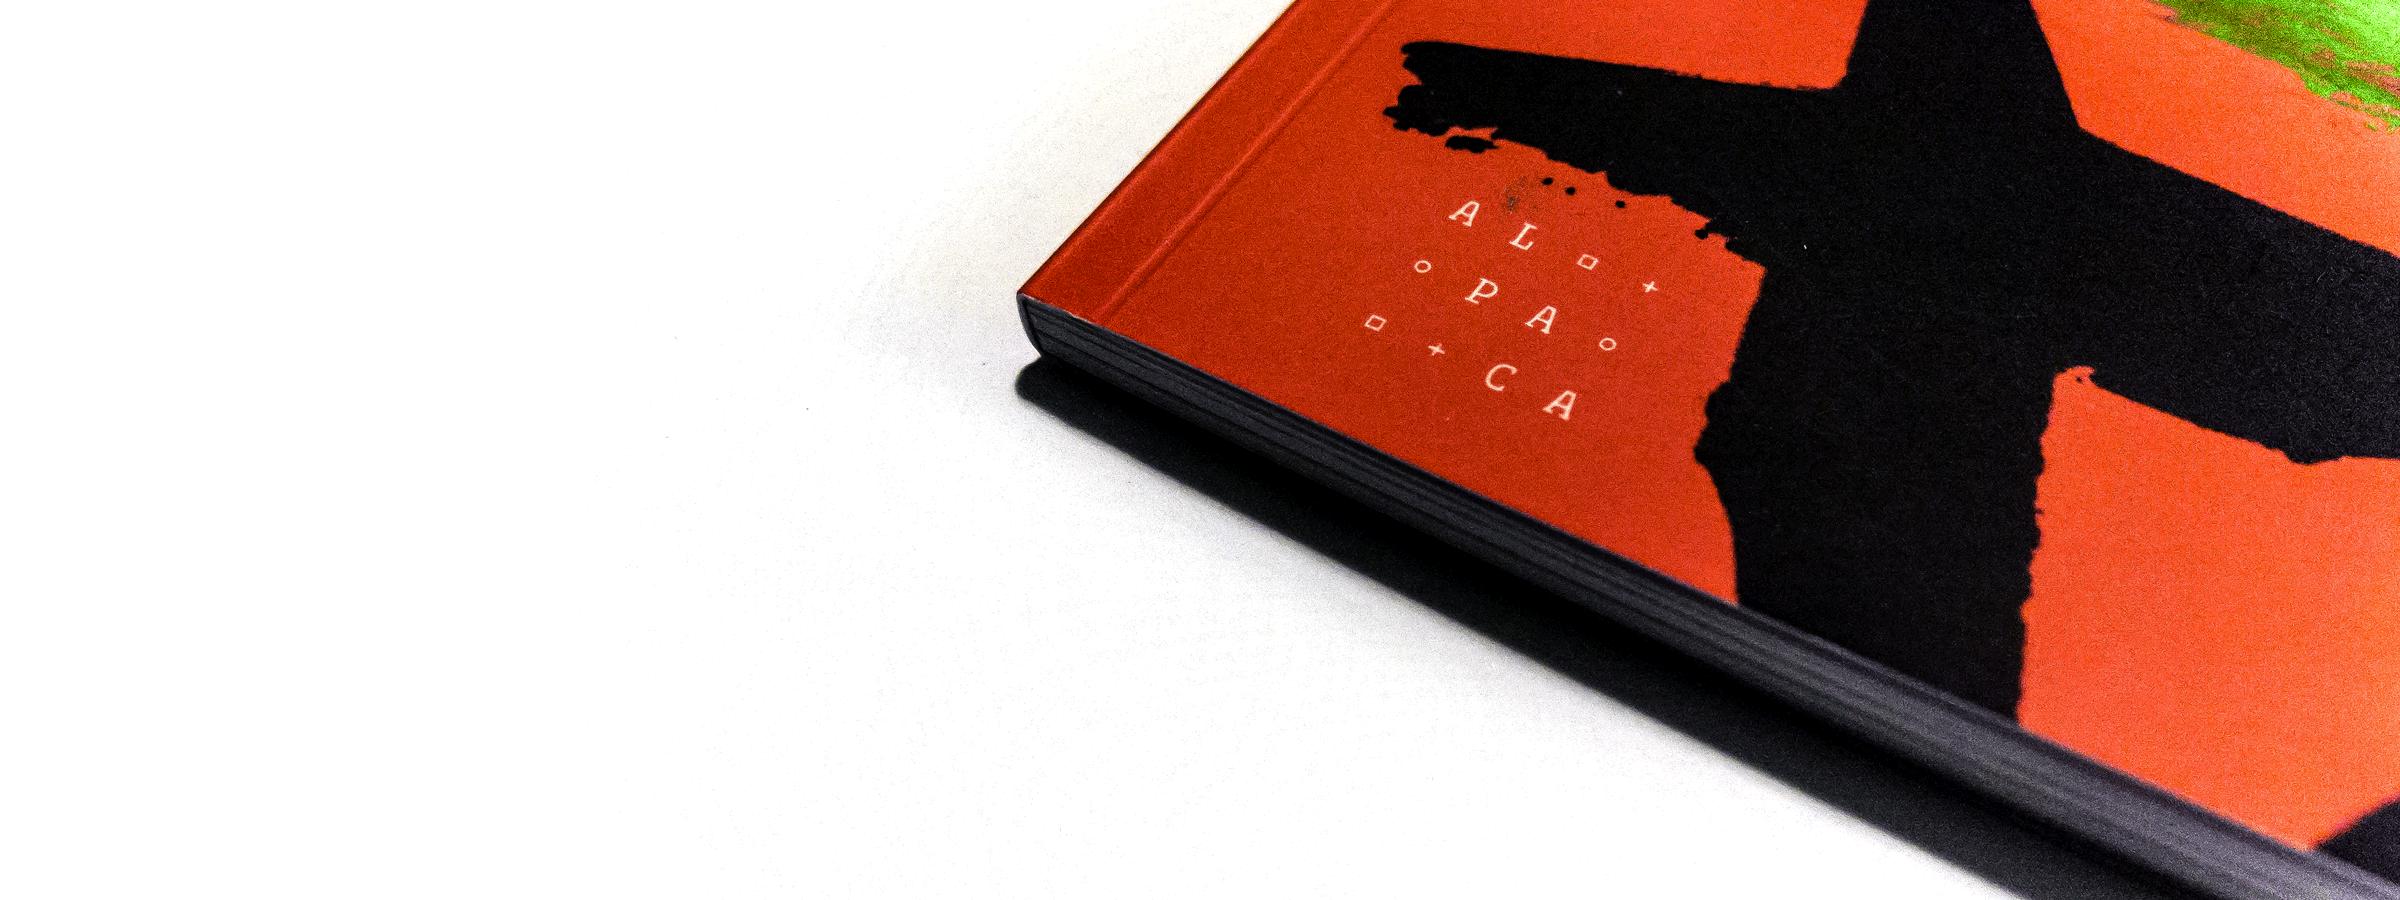 scrittura-e-scritture_libro-pagina_02